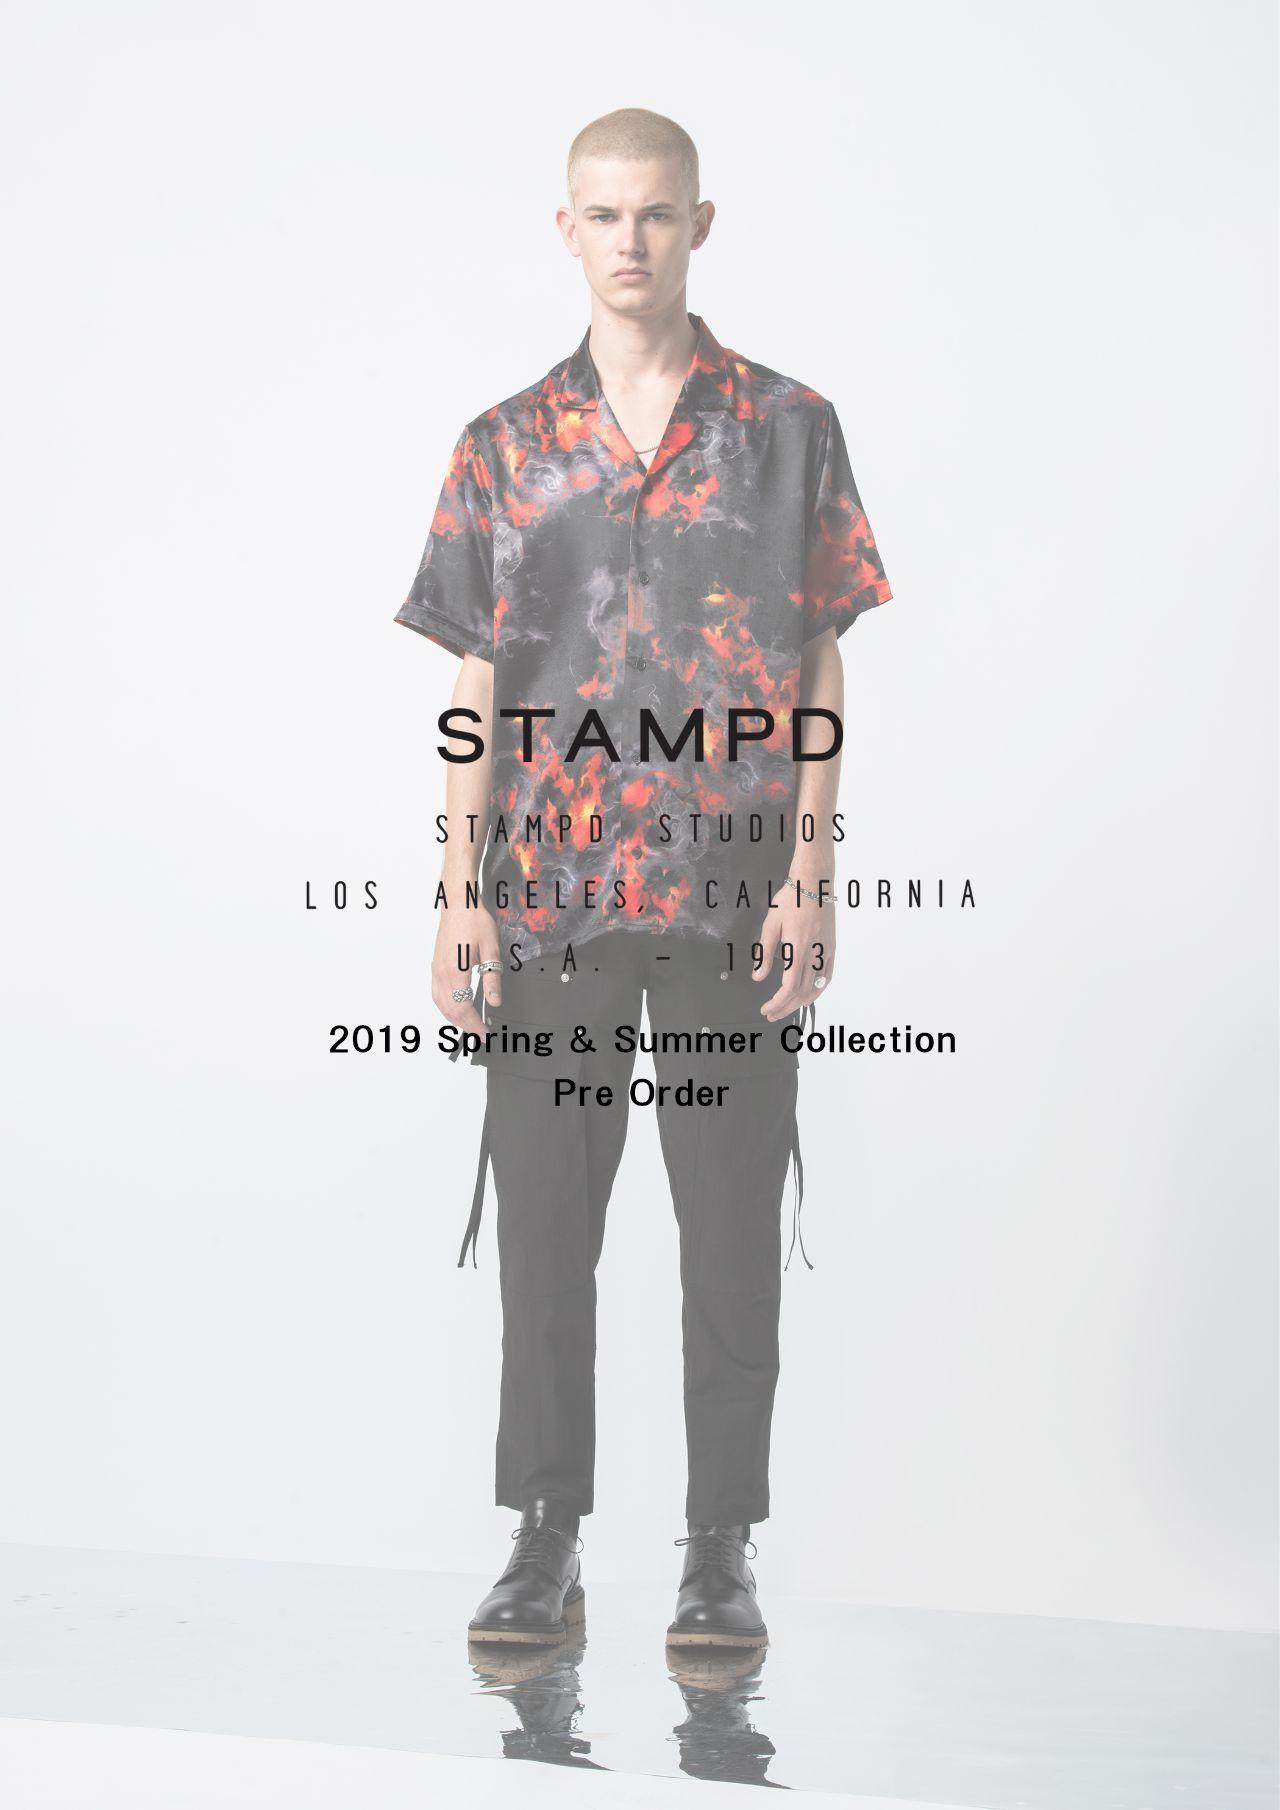 STAMPD 2019Spring & Summer Collection Pre Order会のお知らせの写真